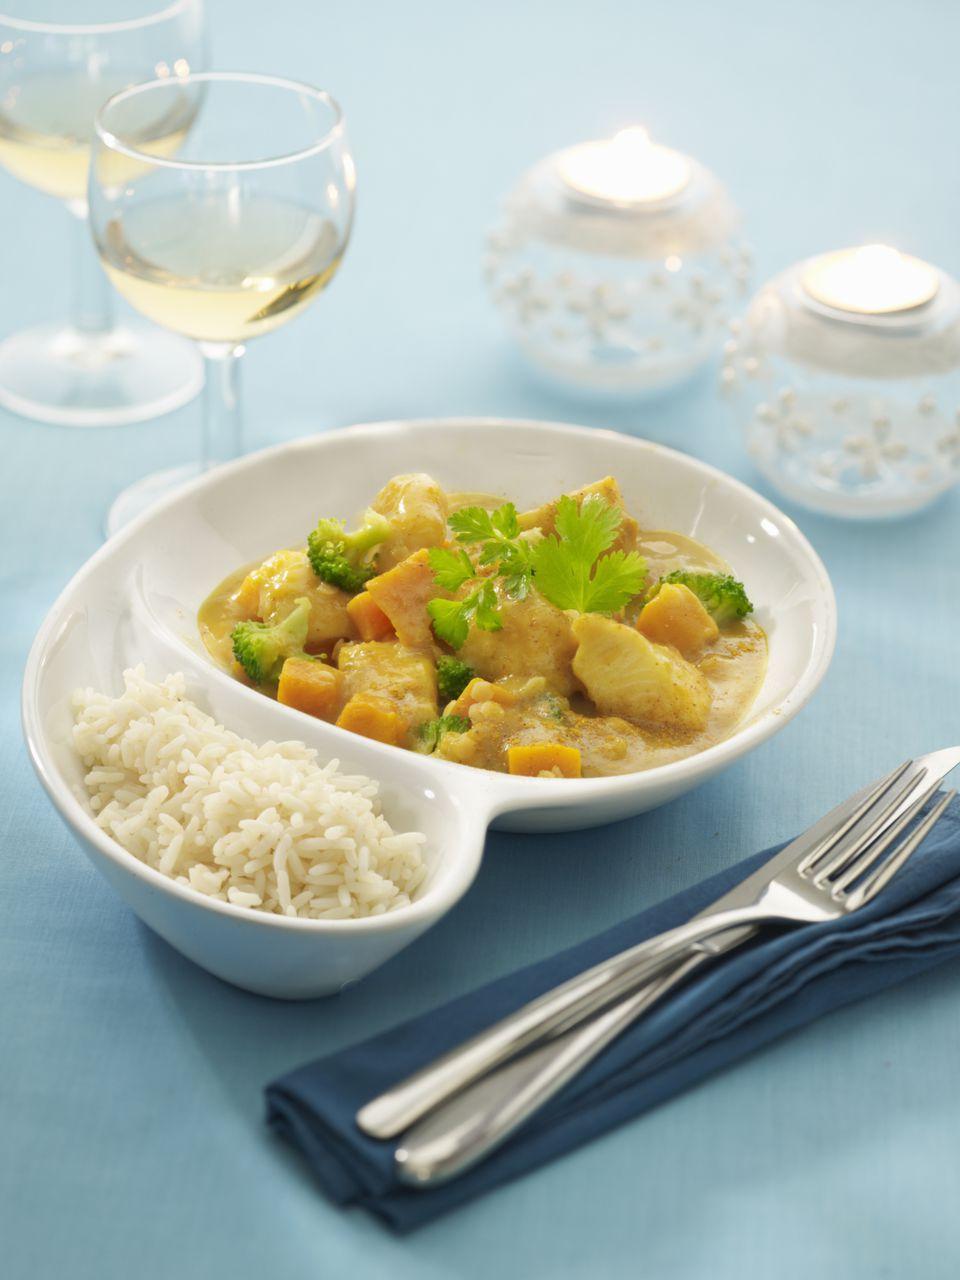 Broccoli and Potato Curry